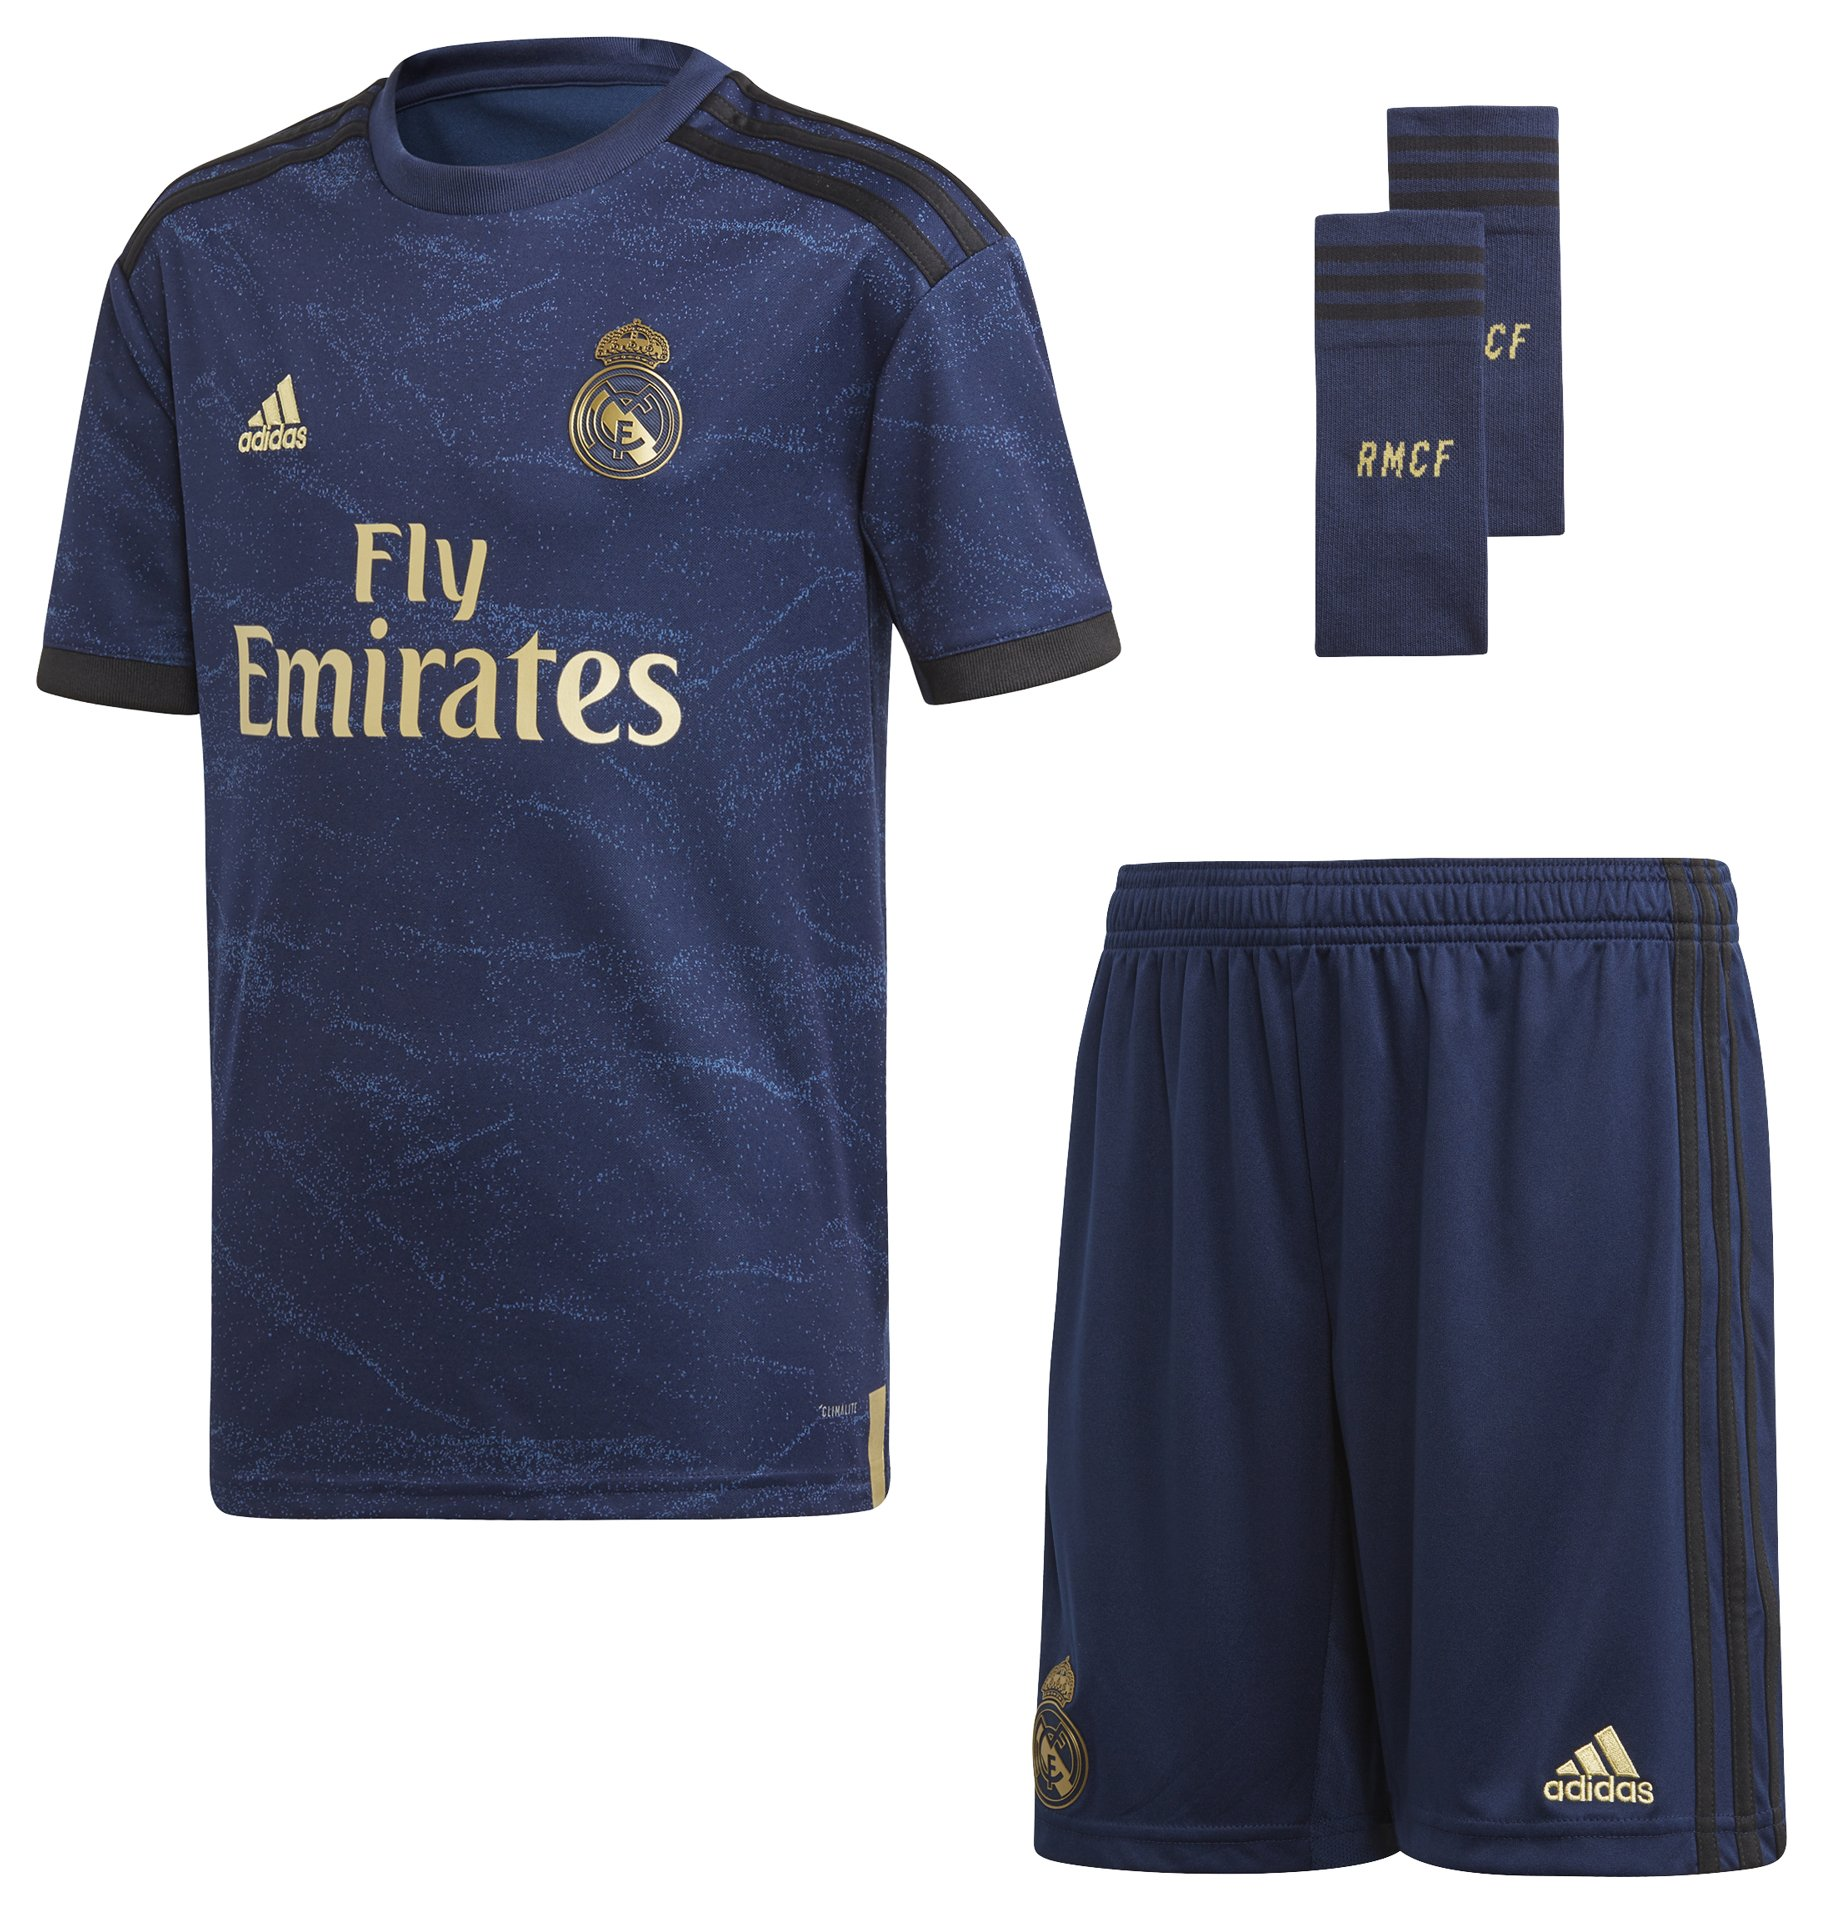 Adidas Real Madrid Football Kits 140